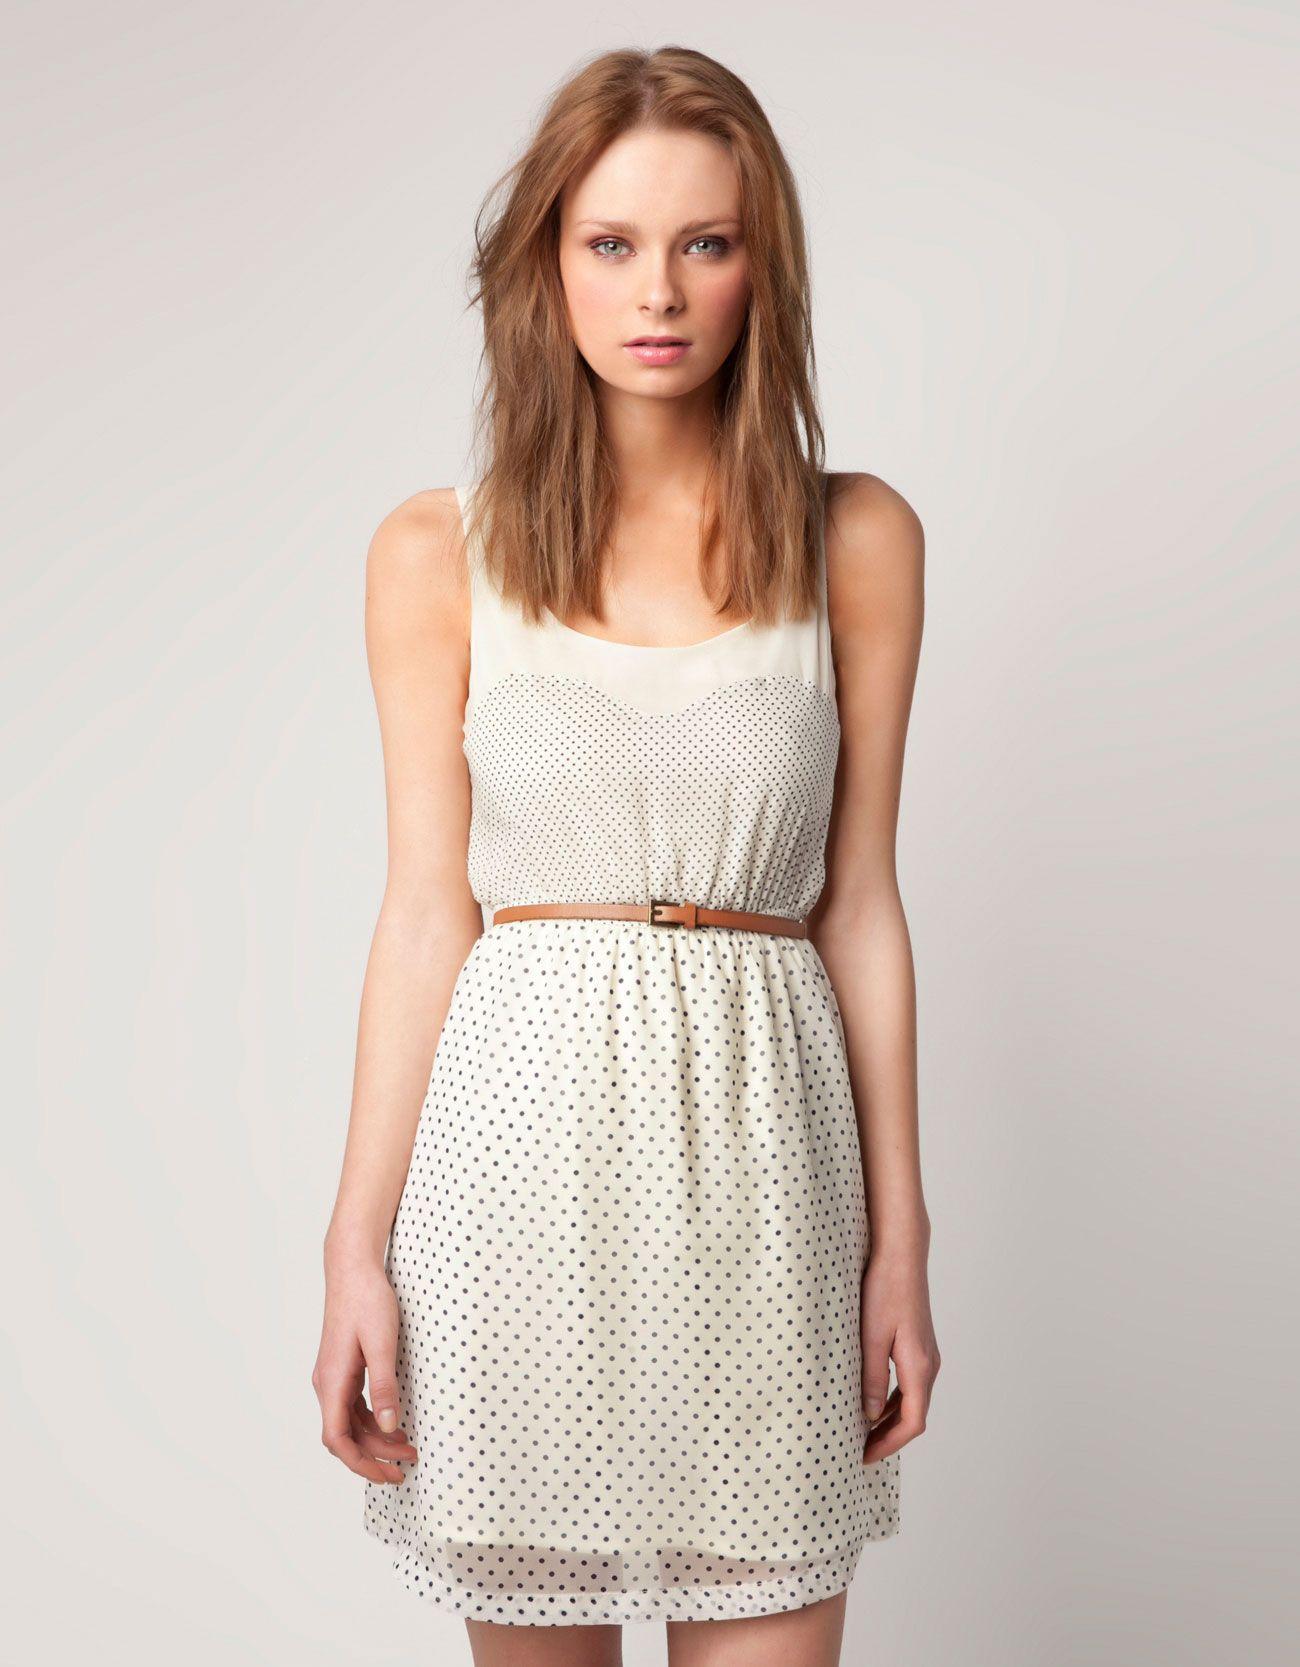 d4032fe01749 $249.00 Dress Skirt, United Kingdom, Feminine Fashion, Belts, Fashion  Clothes, Fall